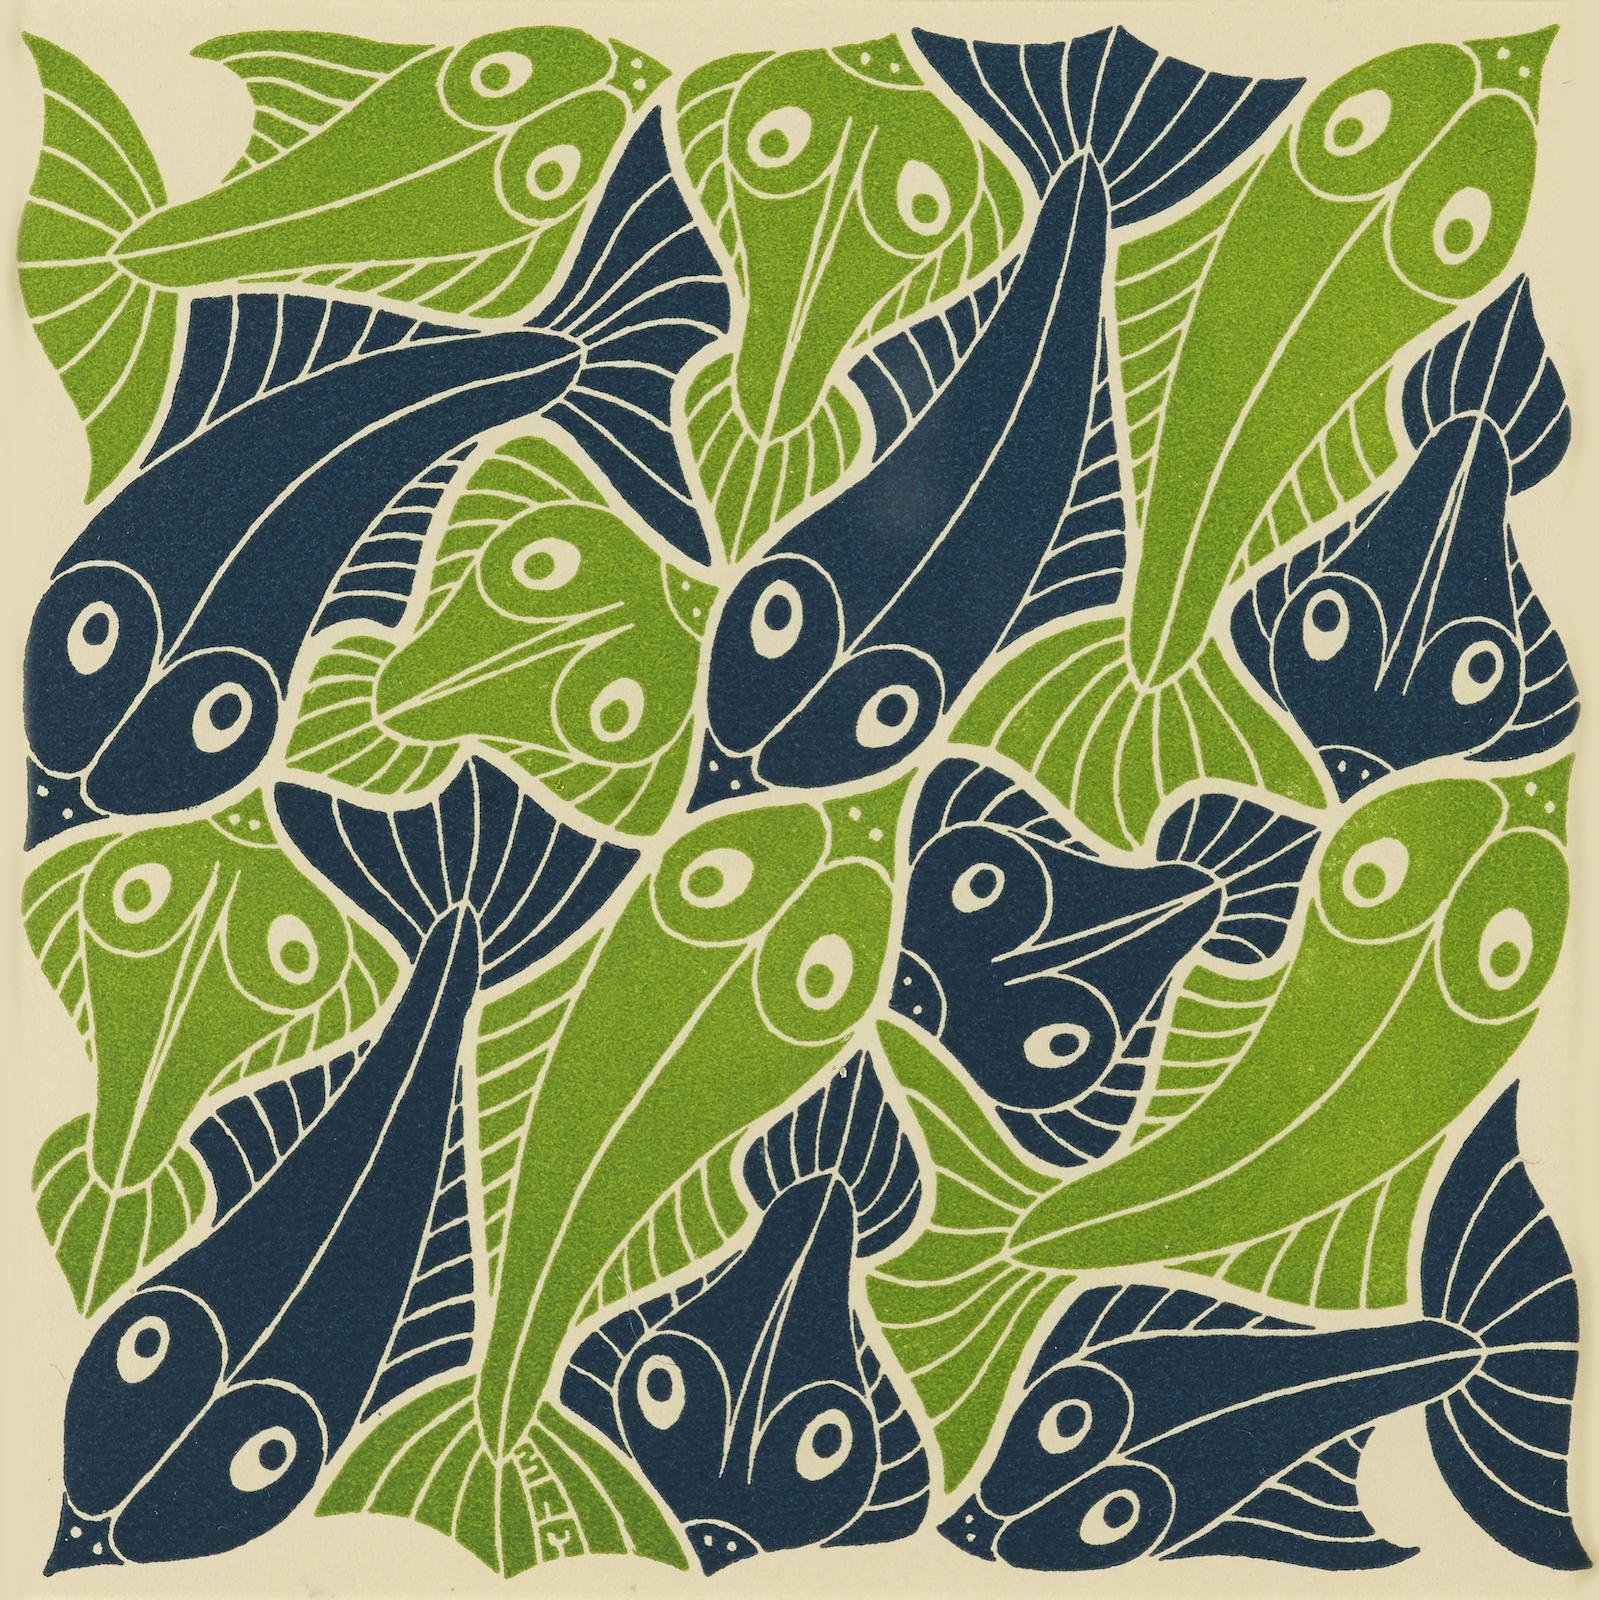 Maurits Cornelis Escher-Four Elements (Air, Earth, Fire, Water) 4 (B. 382-85)-1952